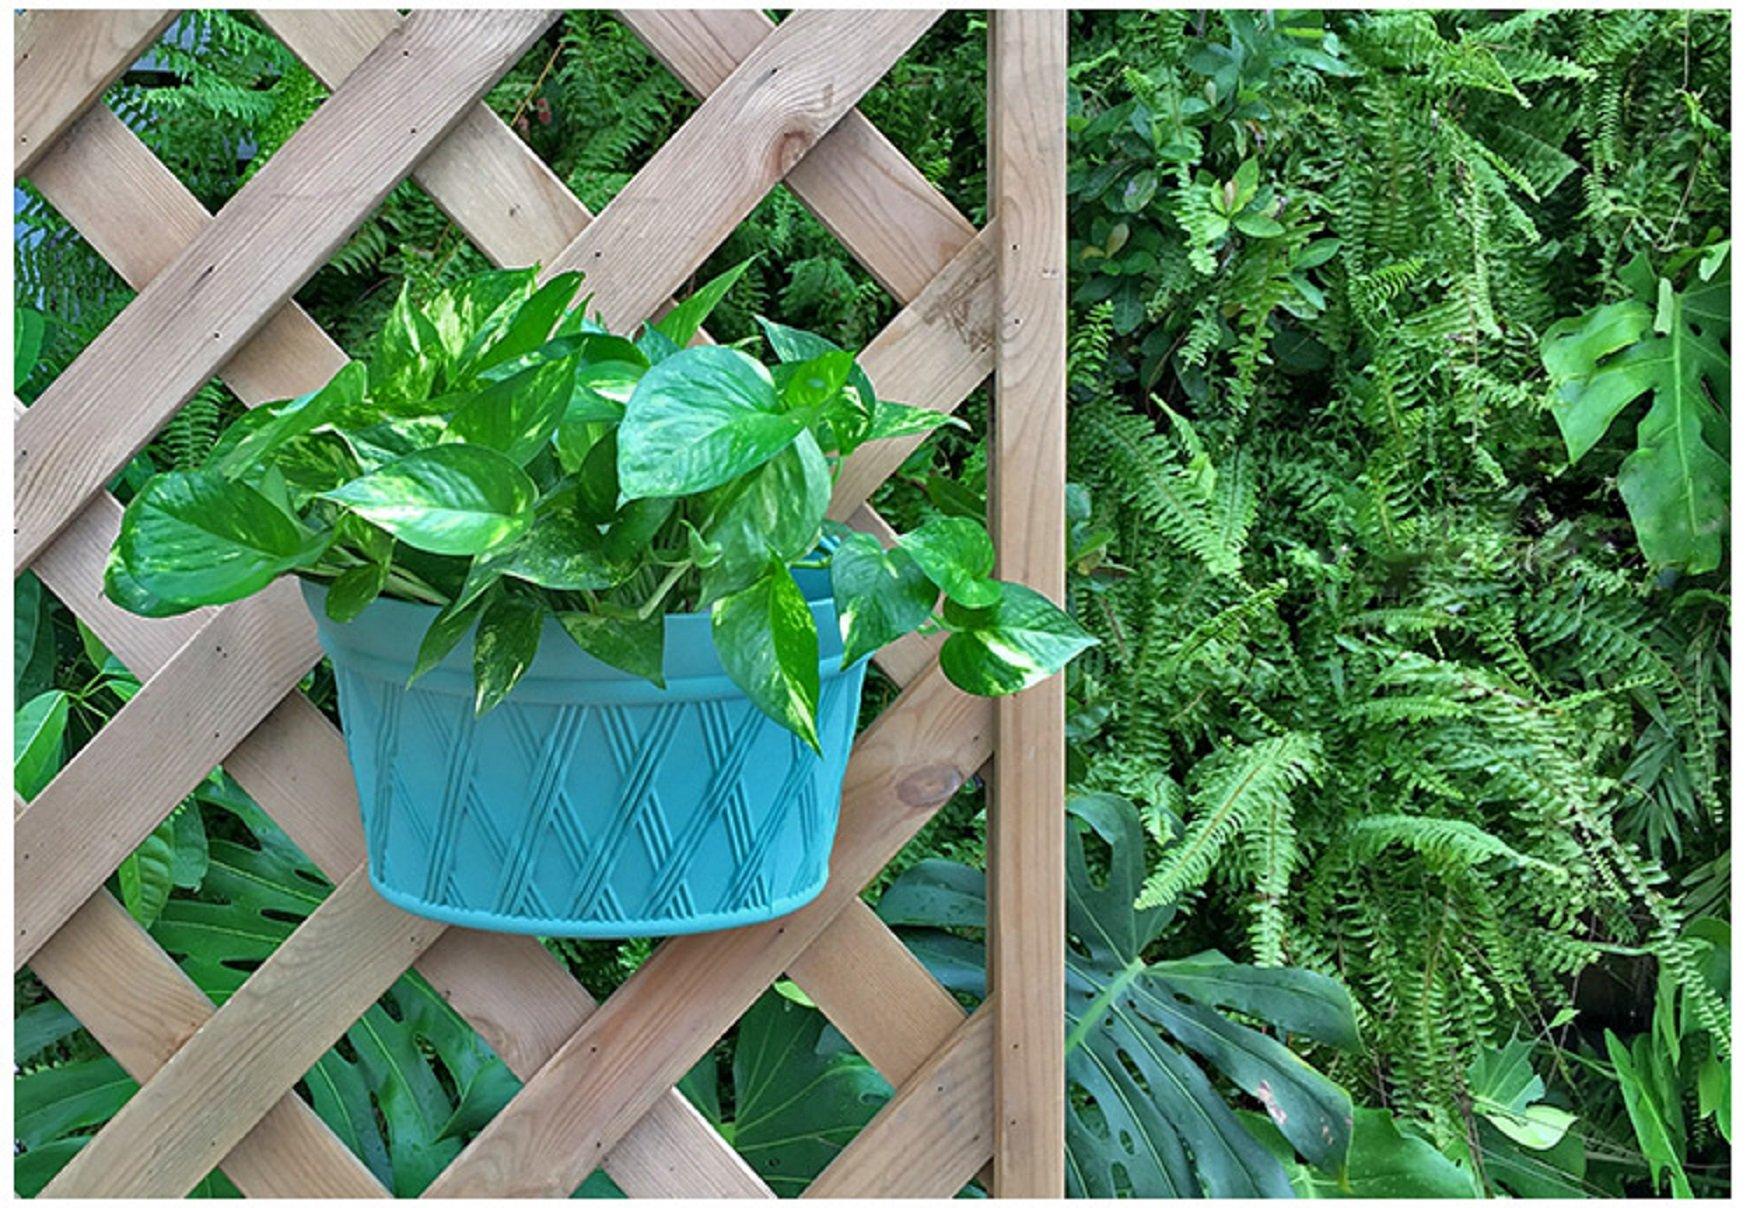 Mr. Garden Resin Plastic Wall Hanging planter Vertical Garden Plant Pot, 12x6.9x8.6Inch, Green, 2Pack